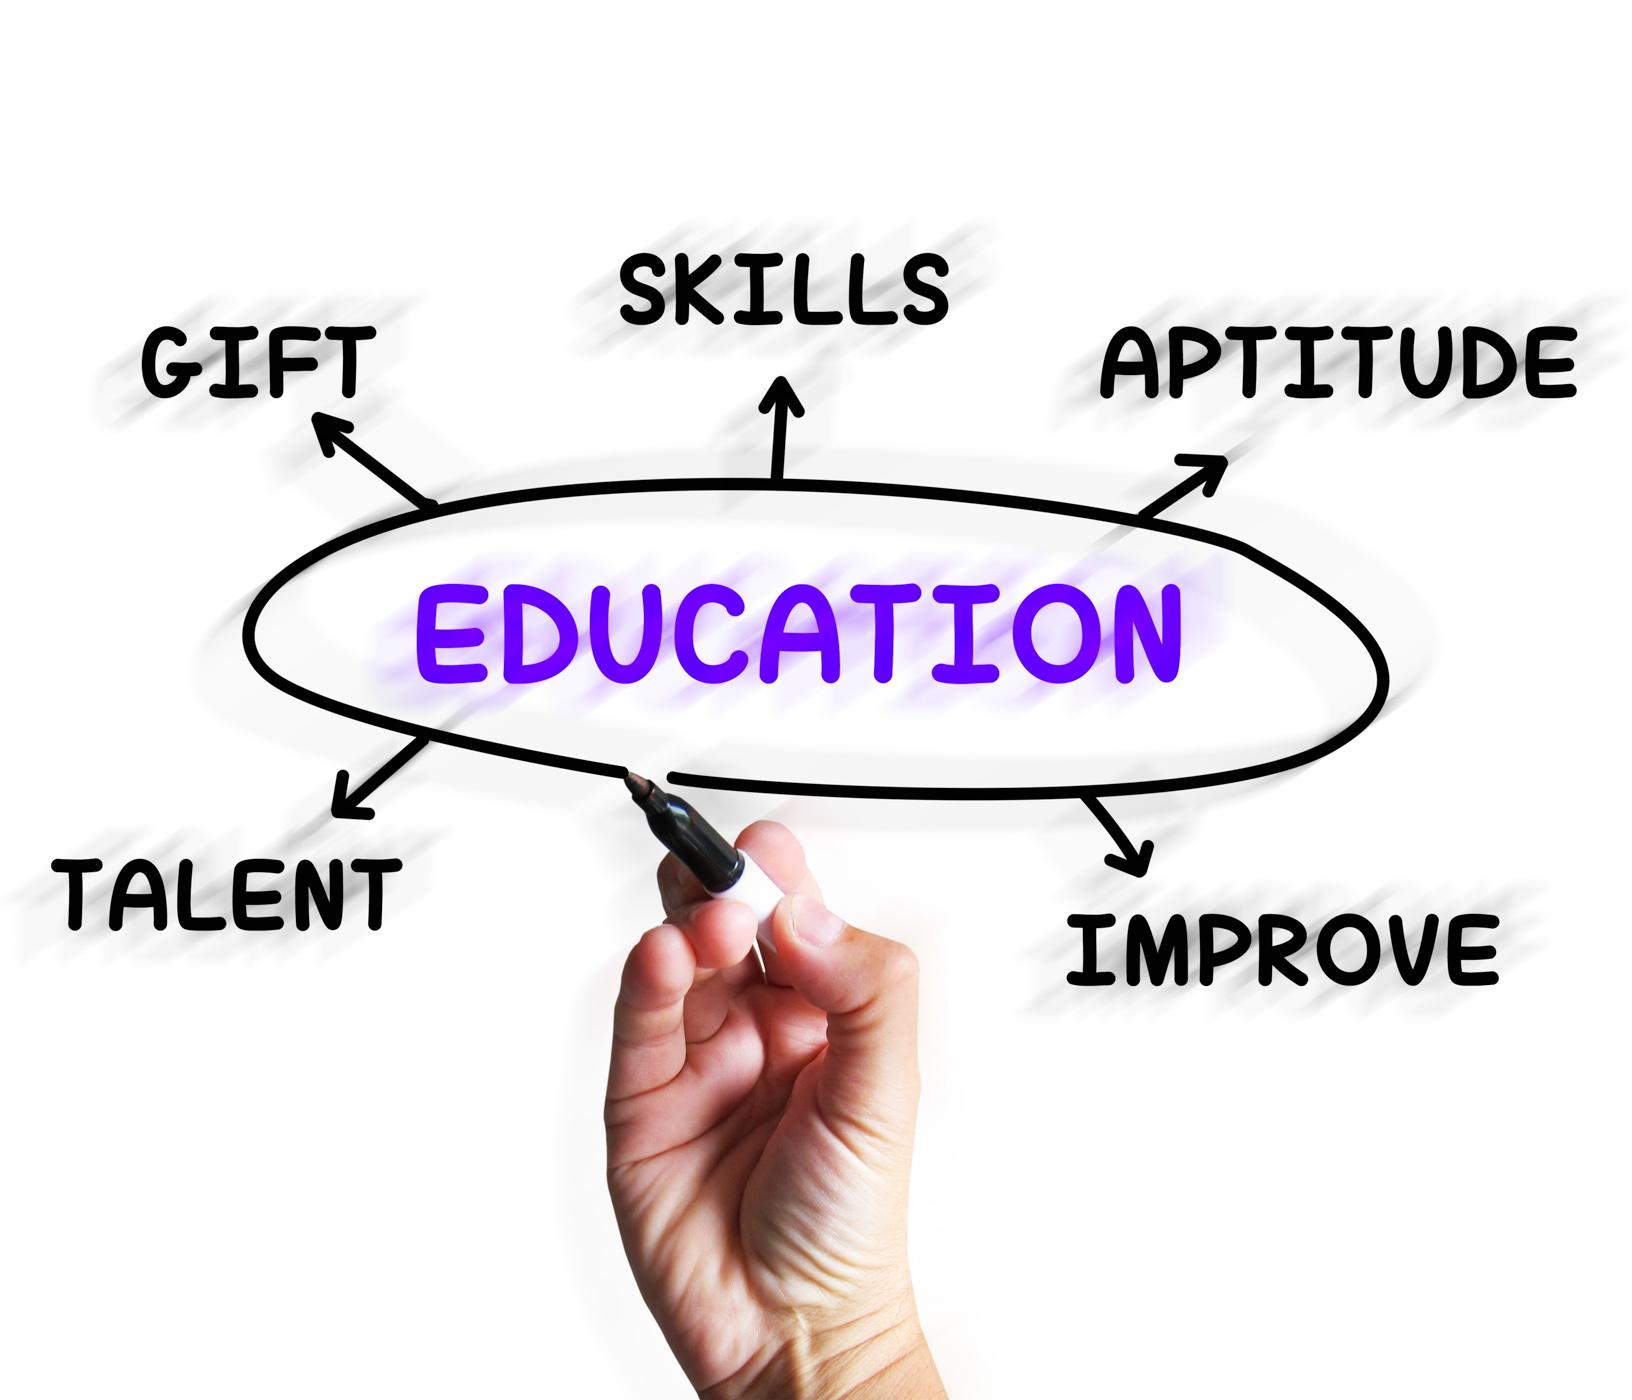 Education Diagram Displays Aptitude Knowledge And Improving, Aptitude, School, Teaching, Teacher, HQ Photo